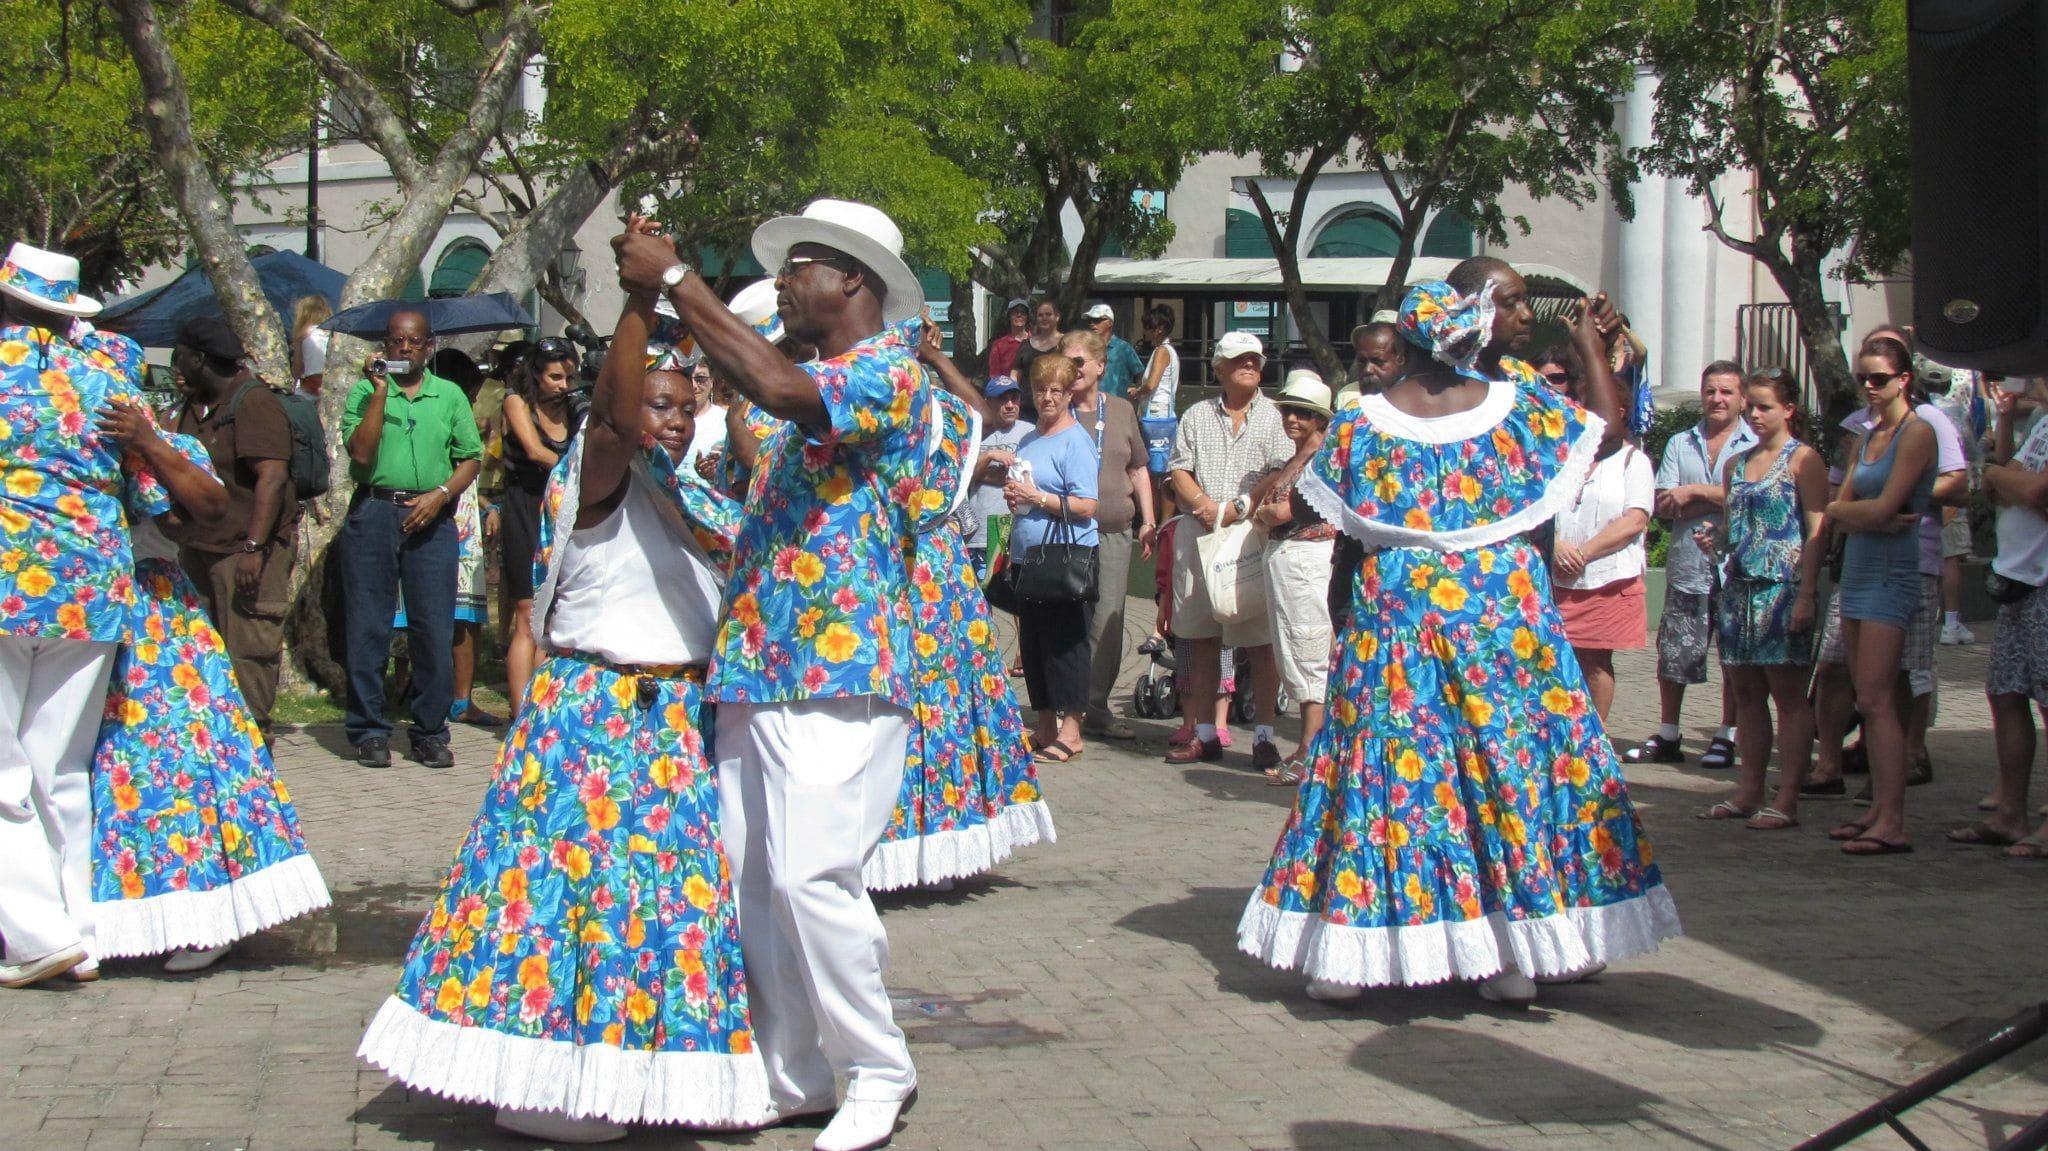 History of jamaican music